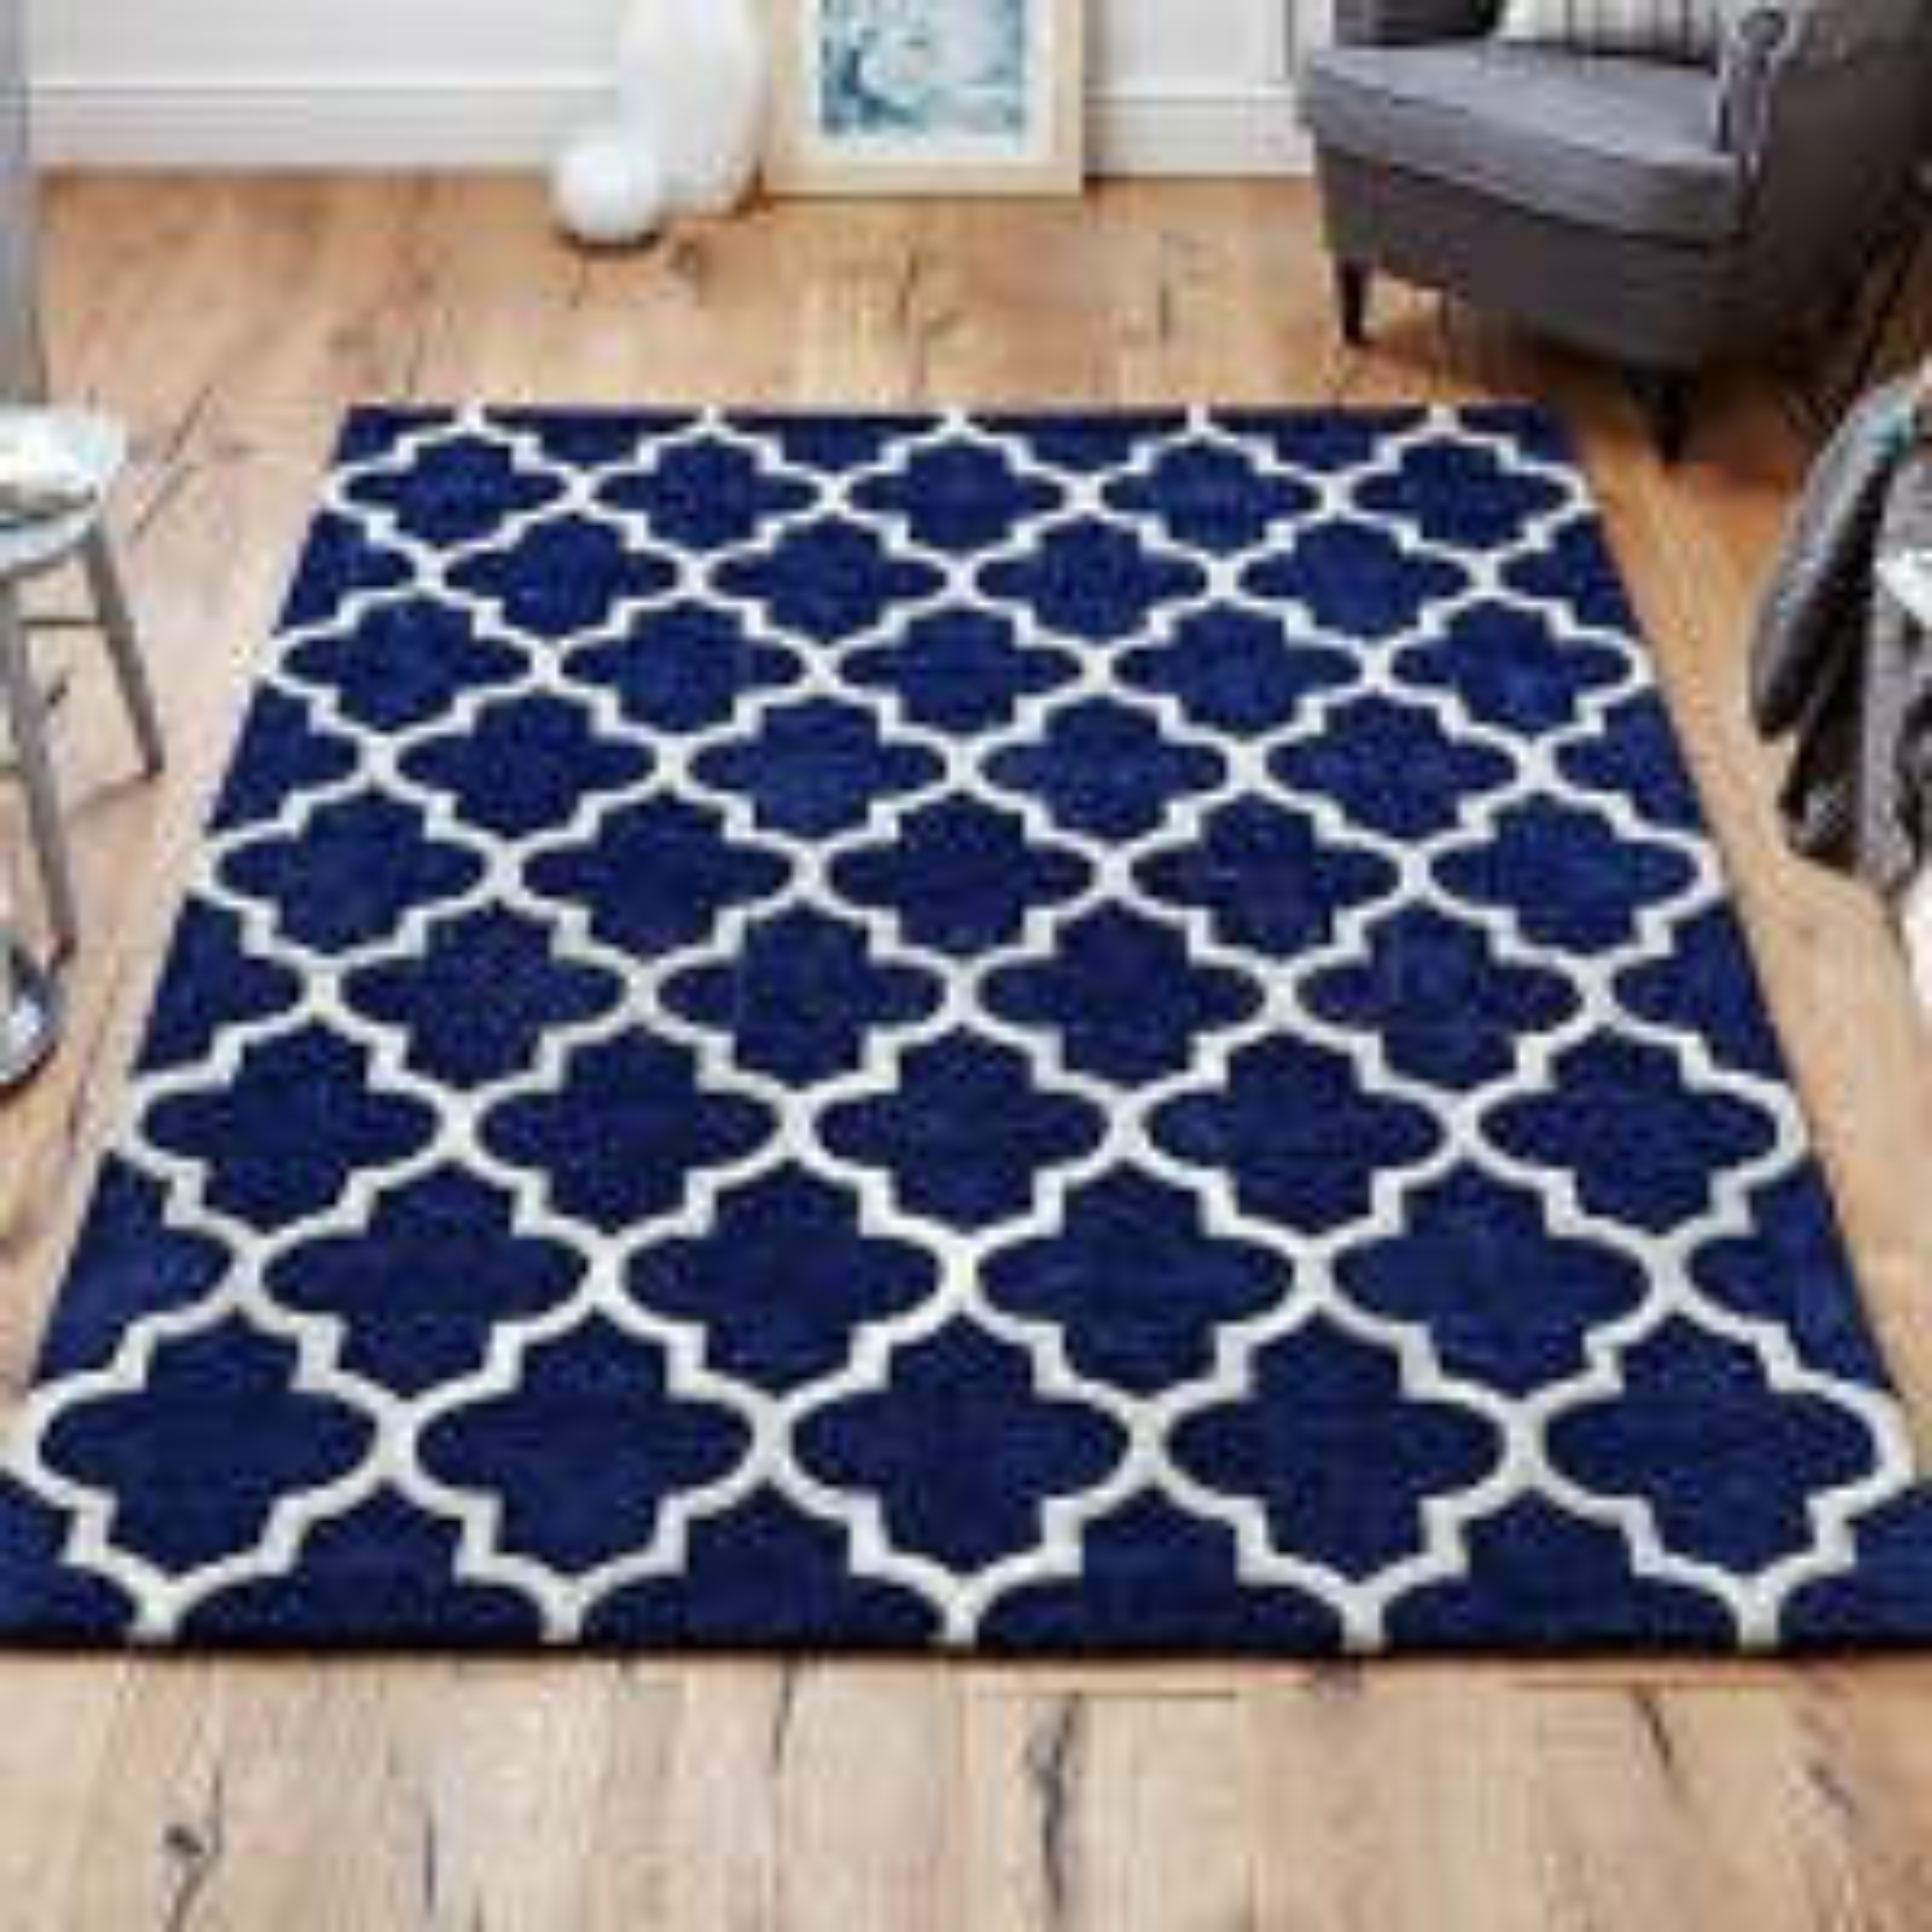 "Arabesque Moroccan Pattern Wool Rug - Blue -80 x 150 cm (2'8"" x 5')"